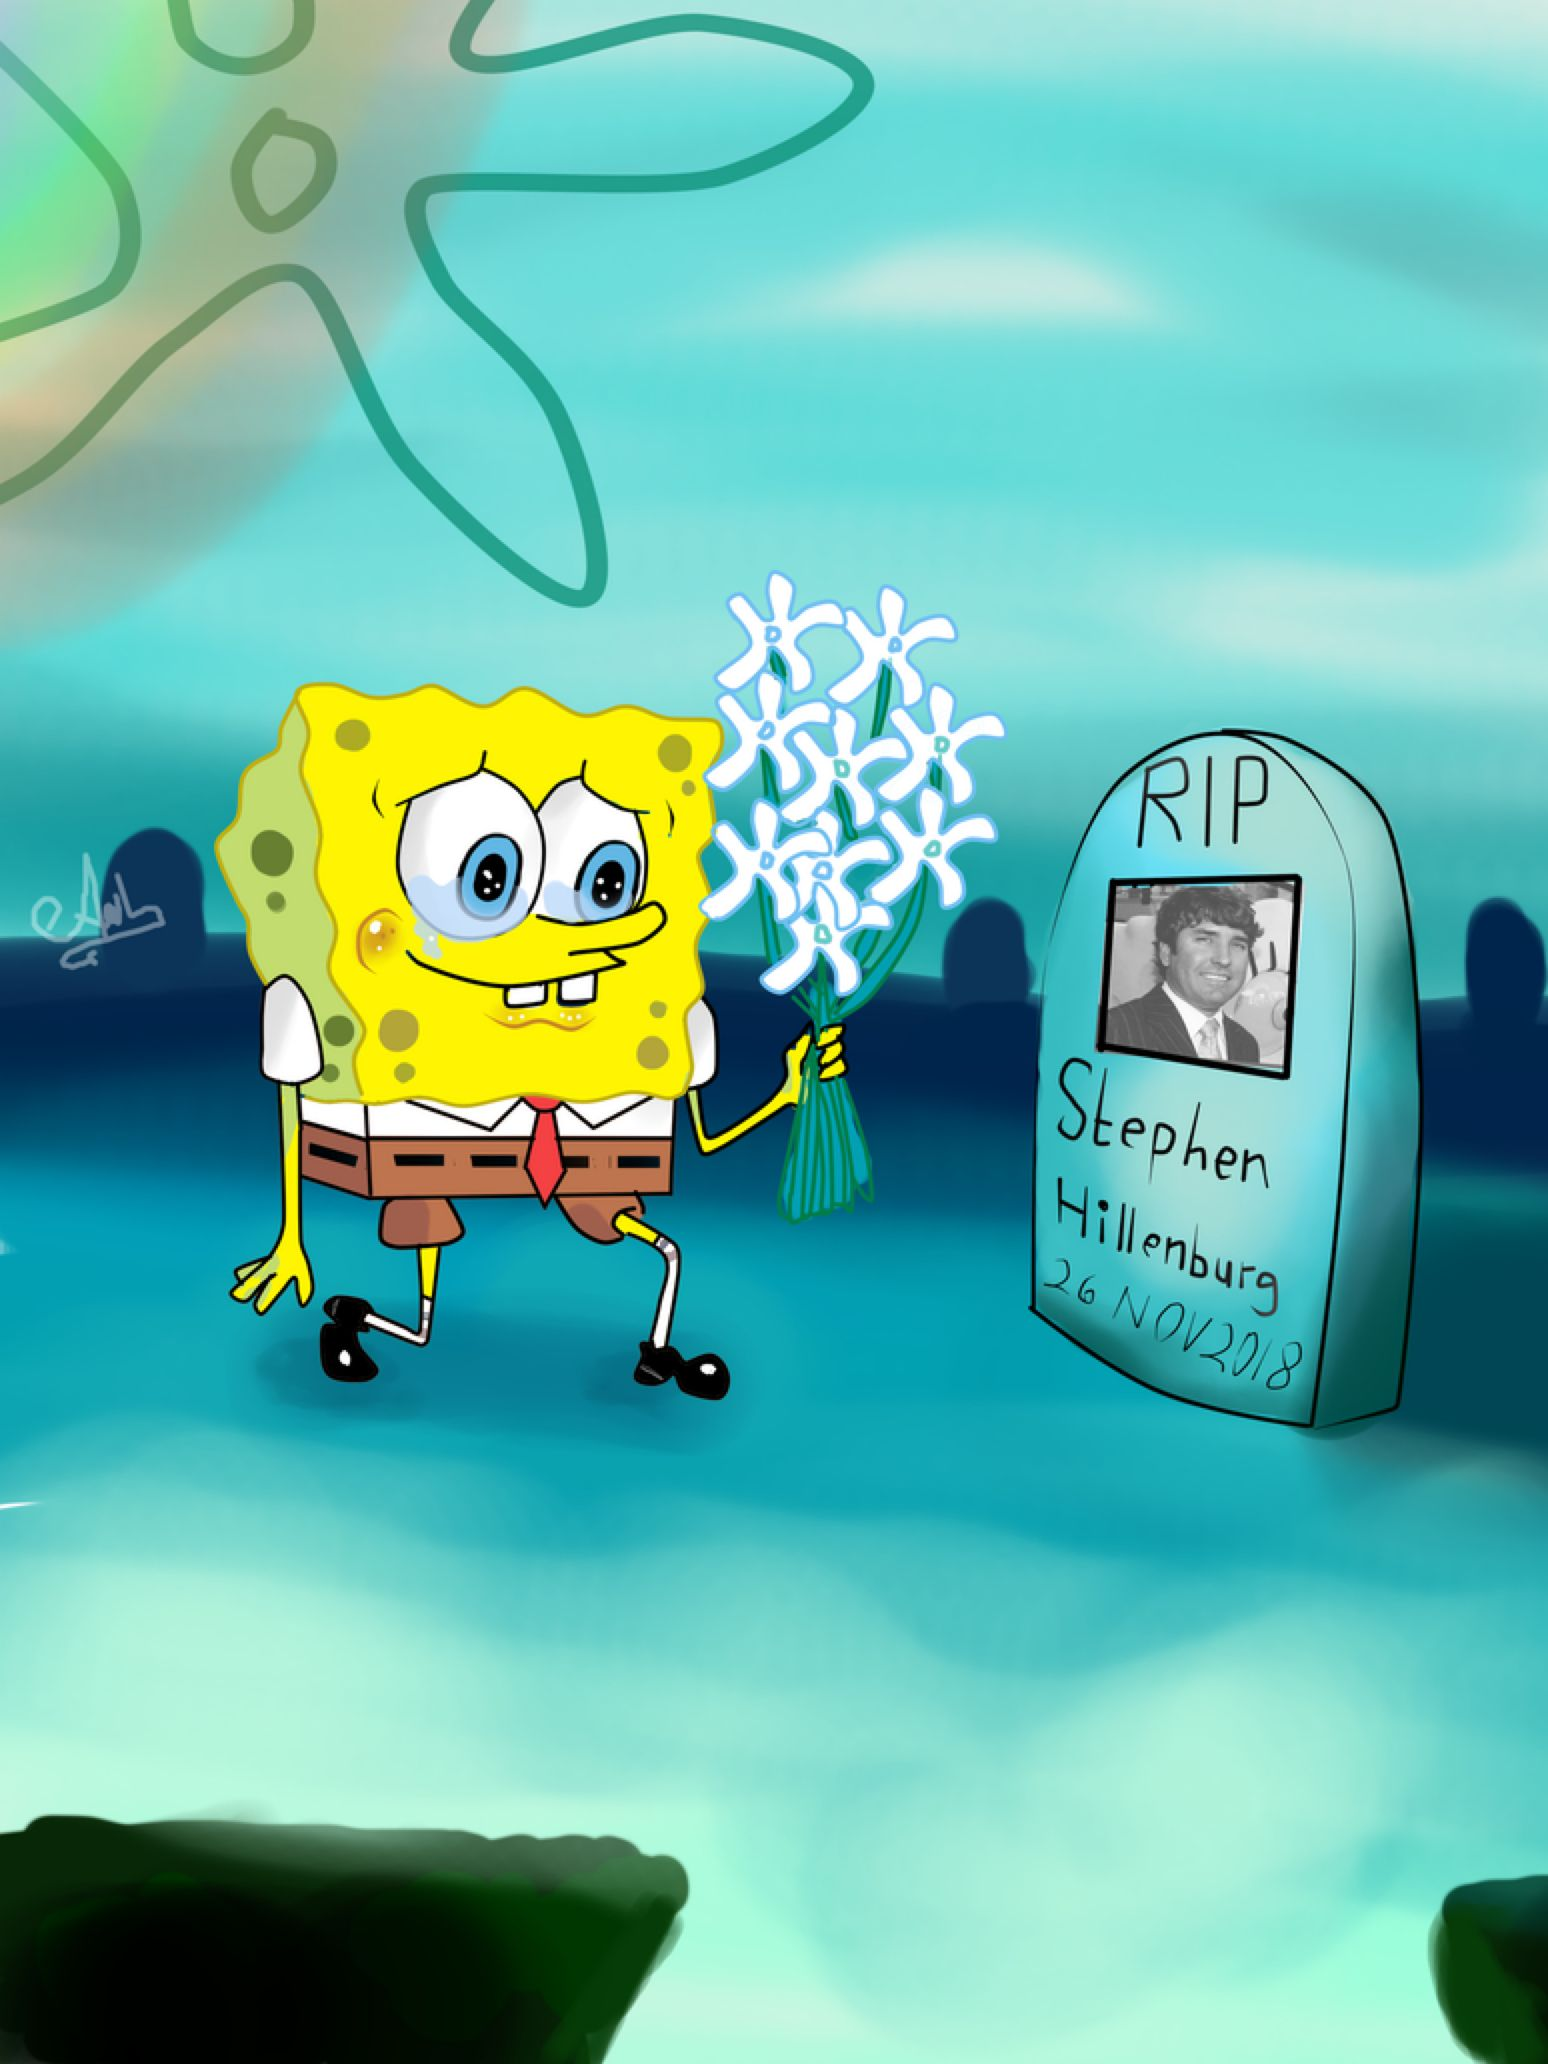 Spongebob Rip Stephen Hillenburg By Latia122 On Deviantart